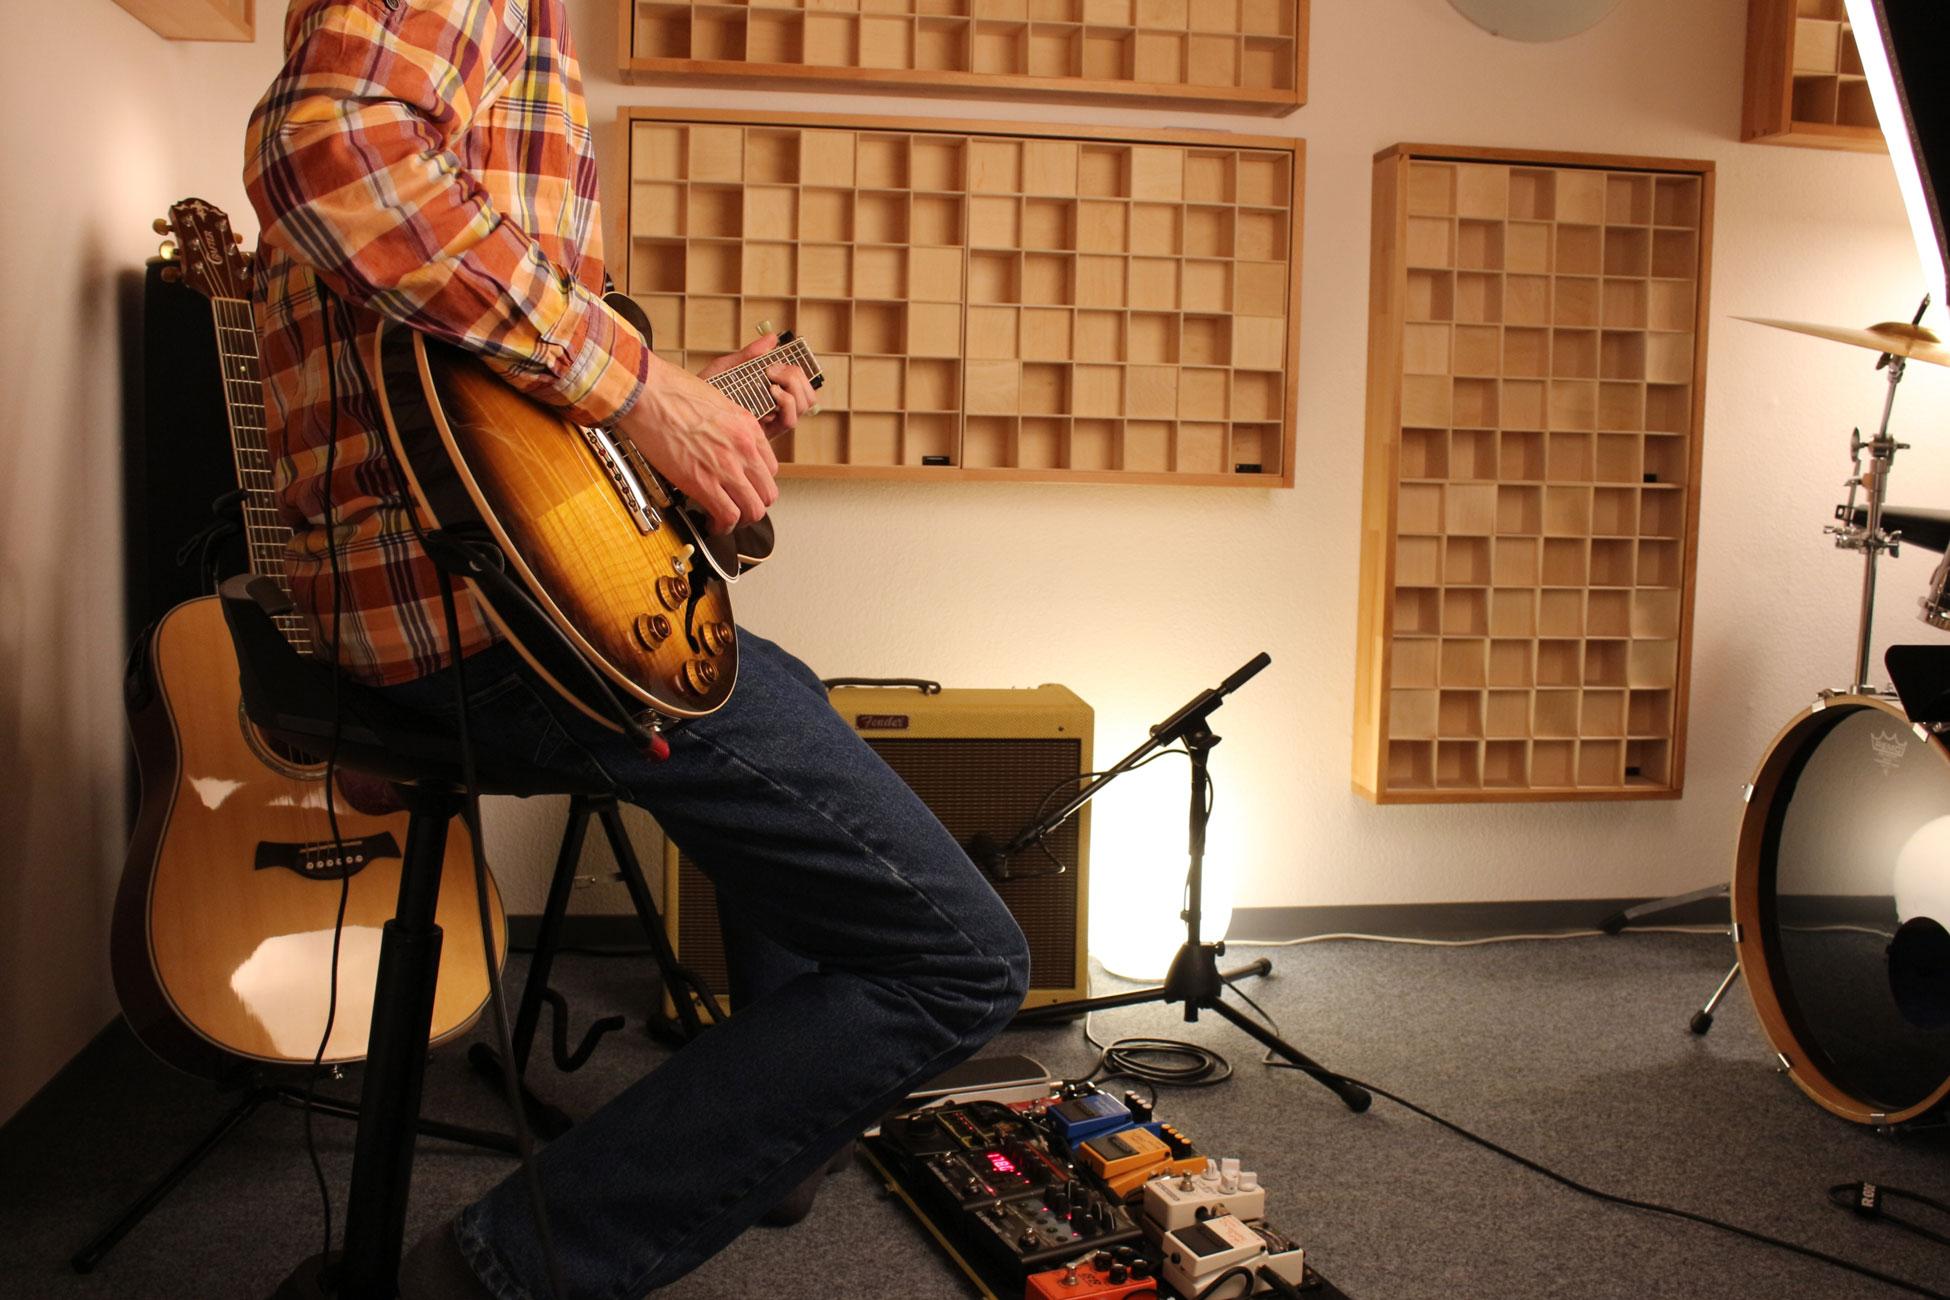 Tonstudio33 Gitarrenaufnahme im Studio - recording guitar